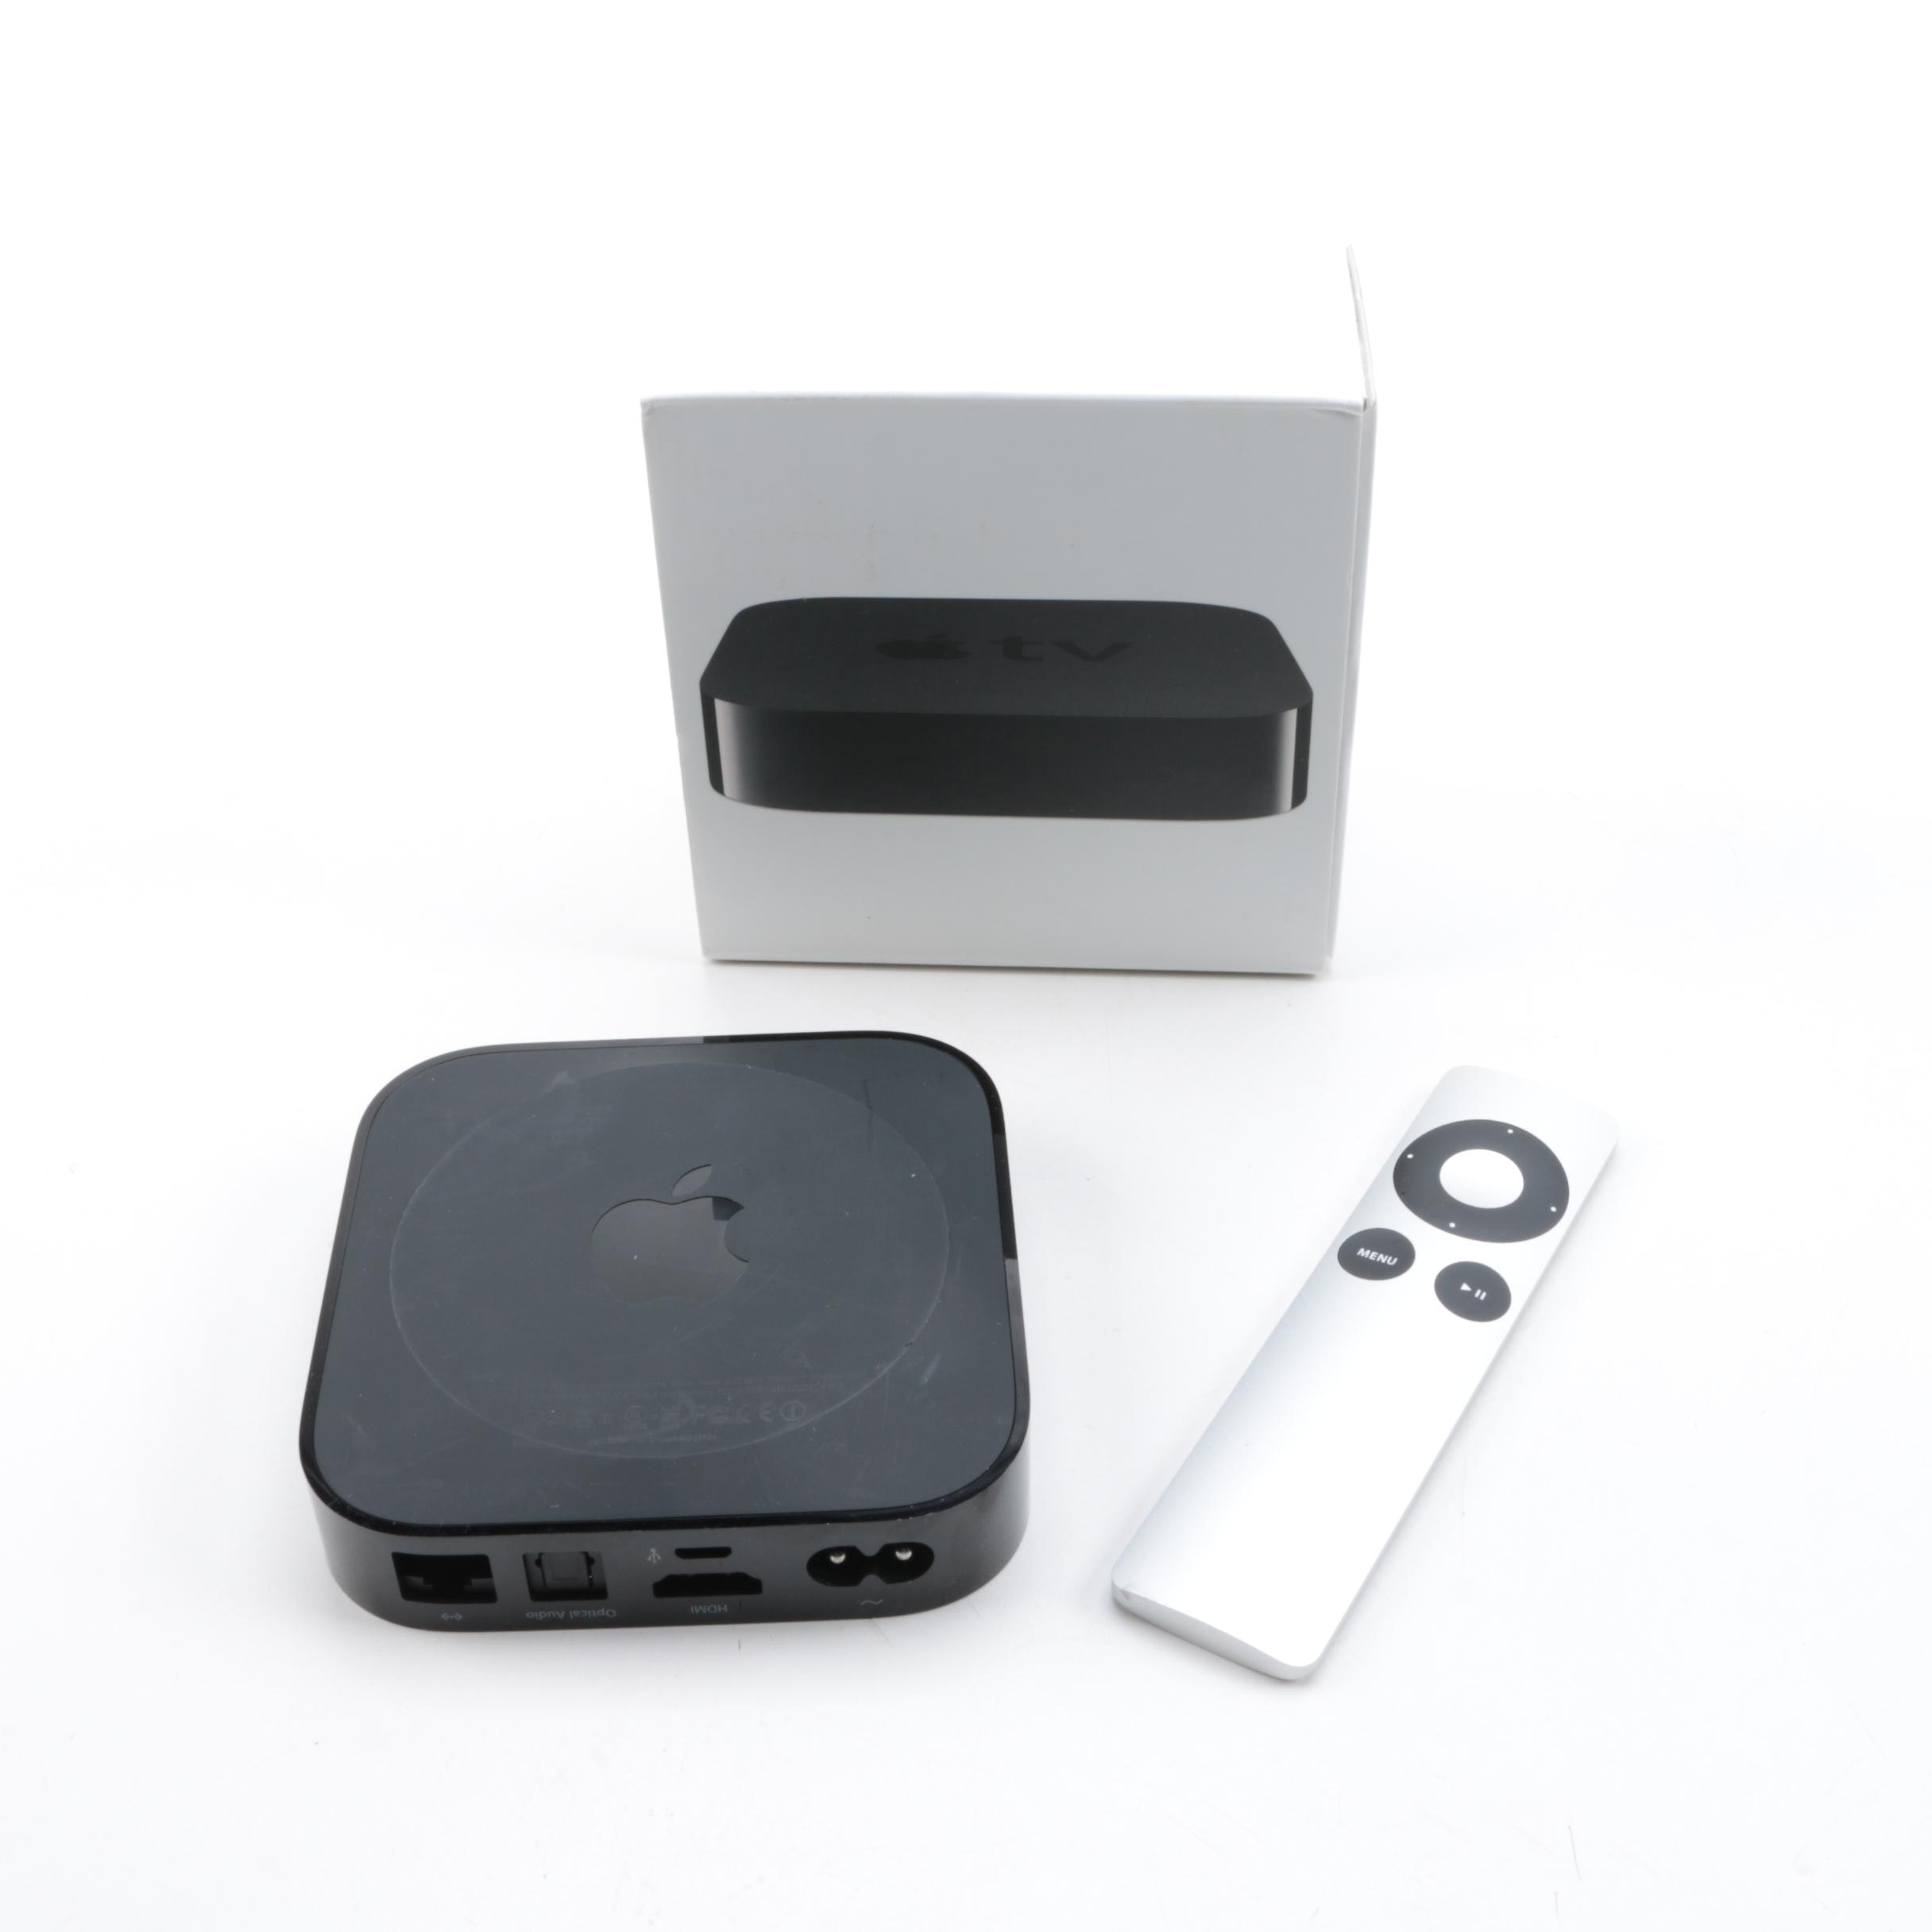 3rd Generation Apple TV